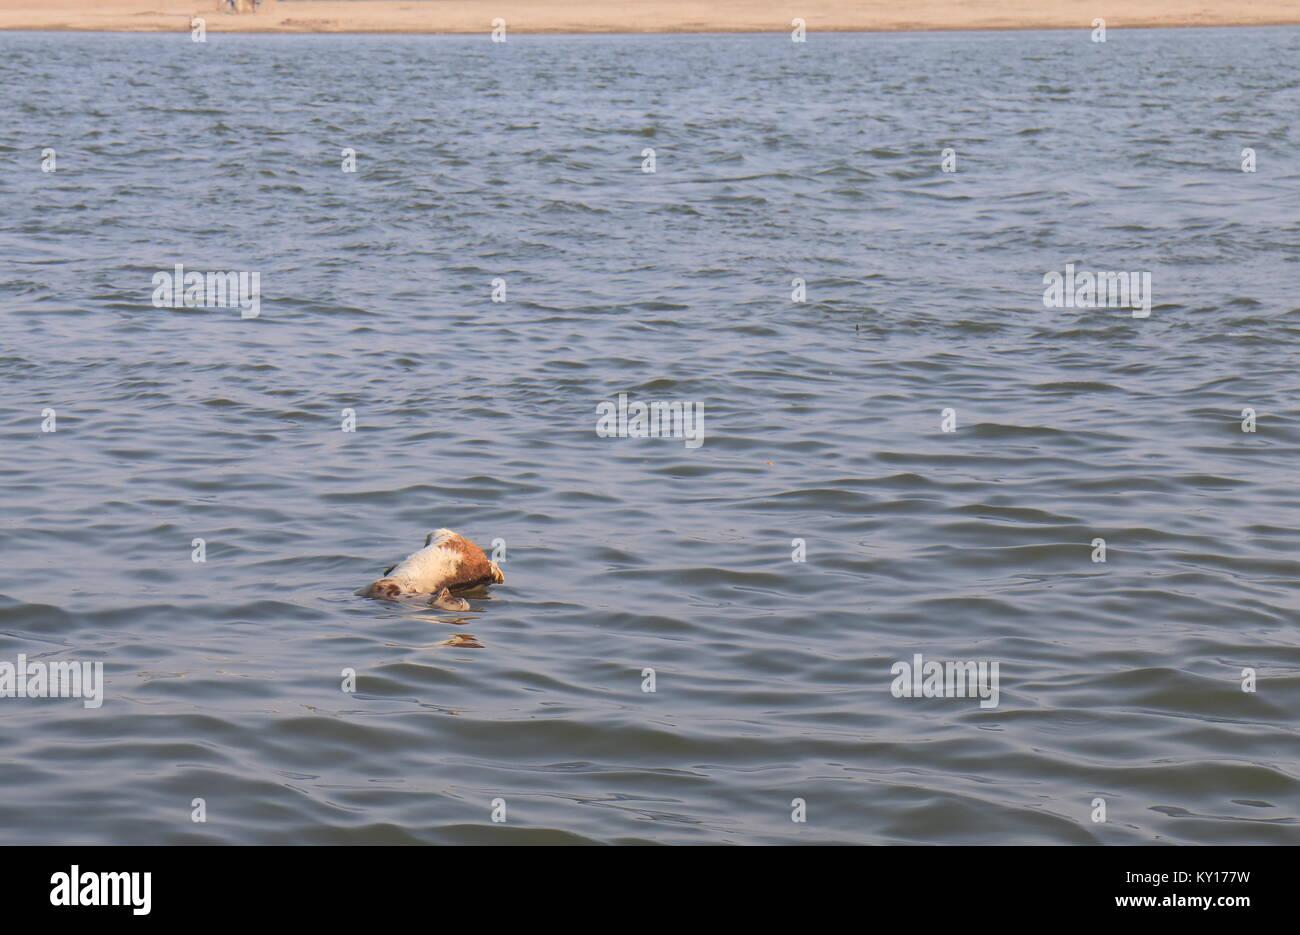 Dead sheep Ganges river pollution Varanasi India - Stock Image